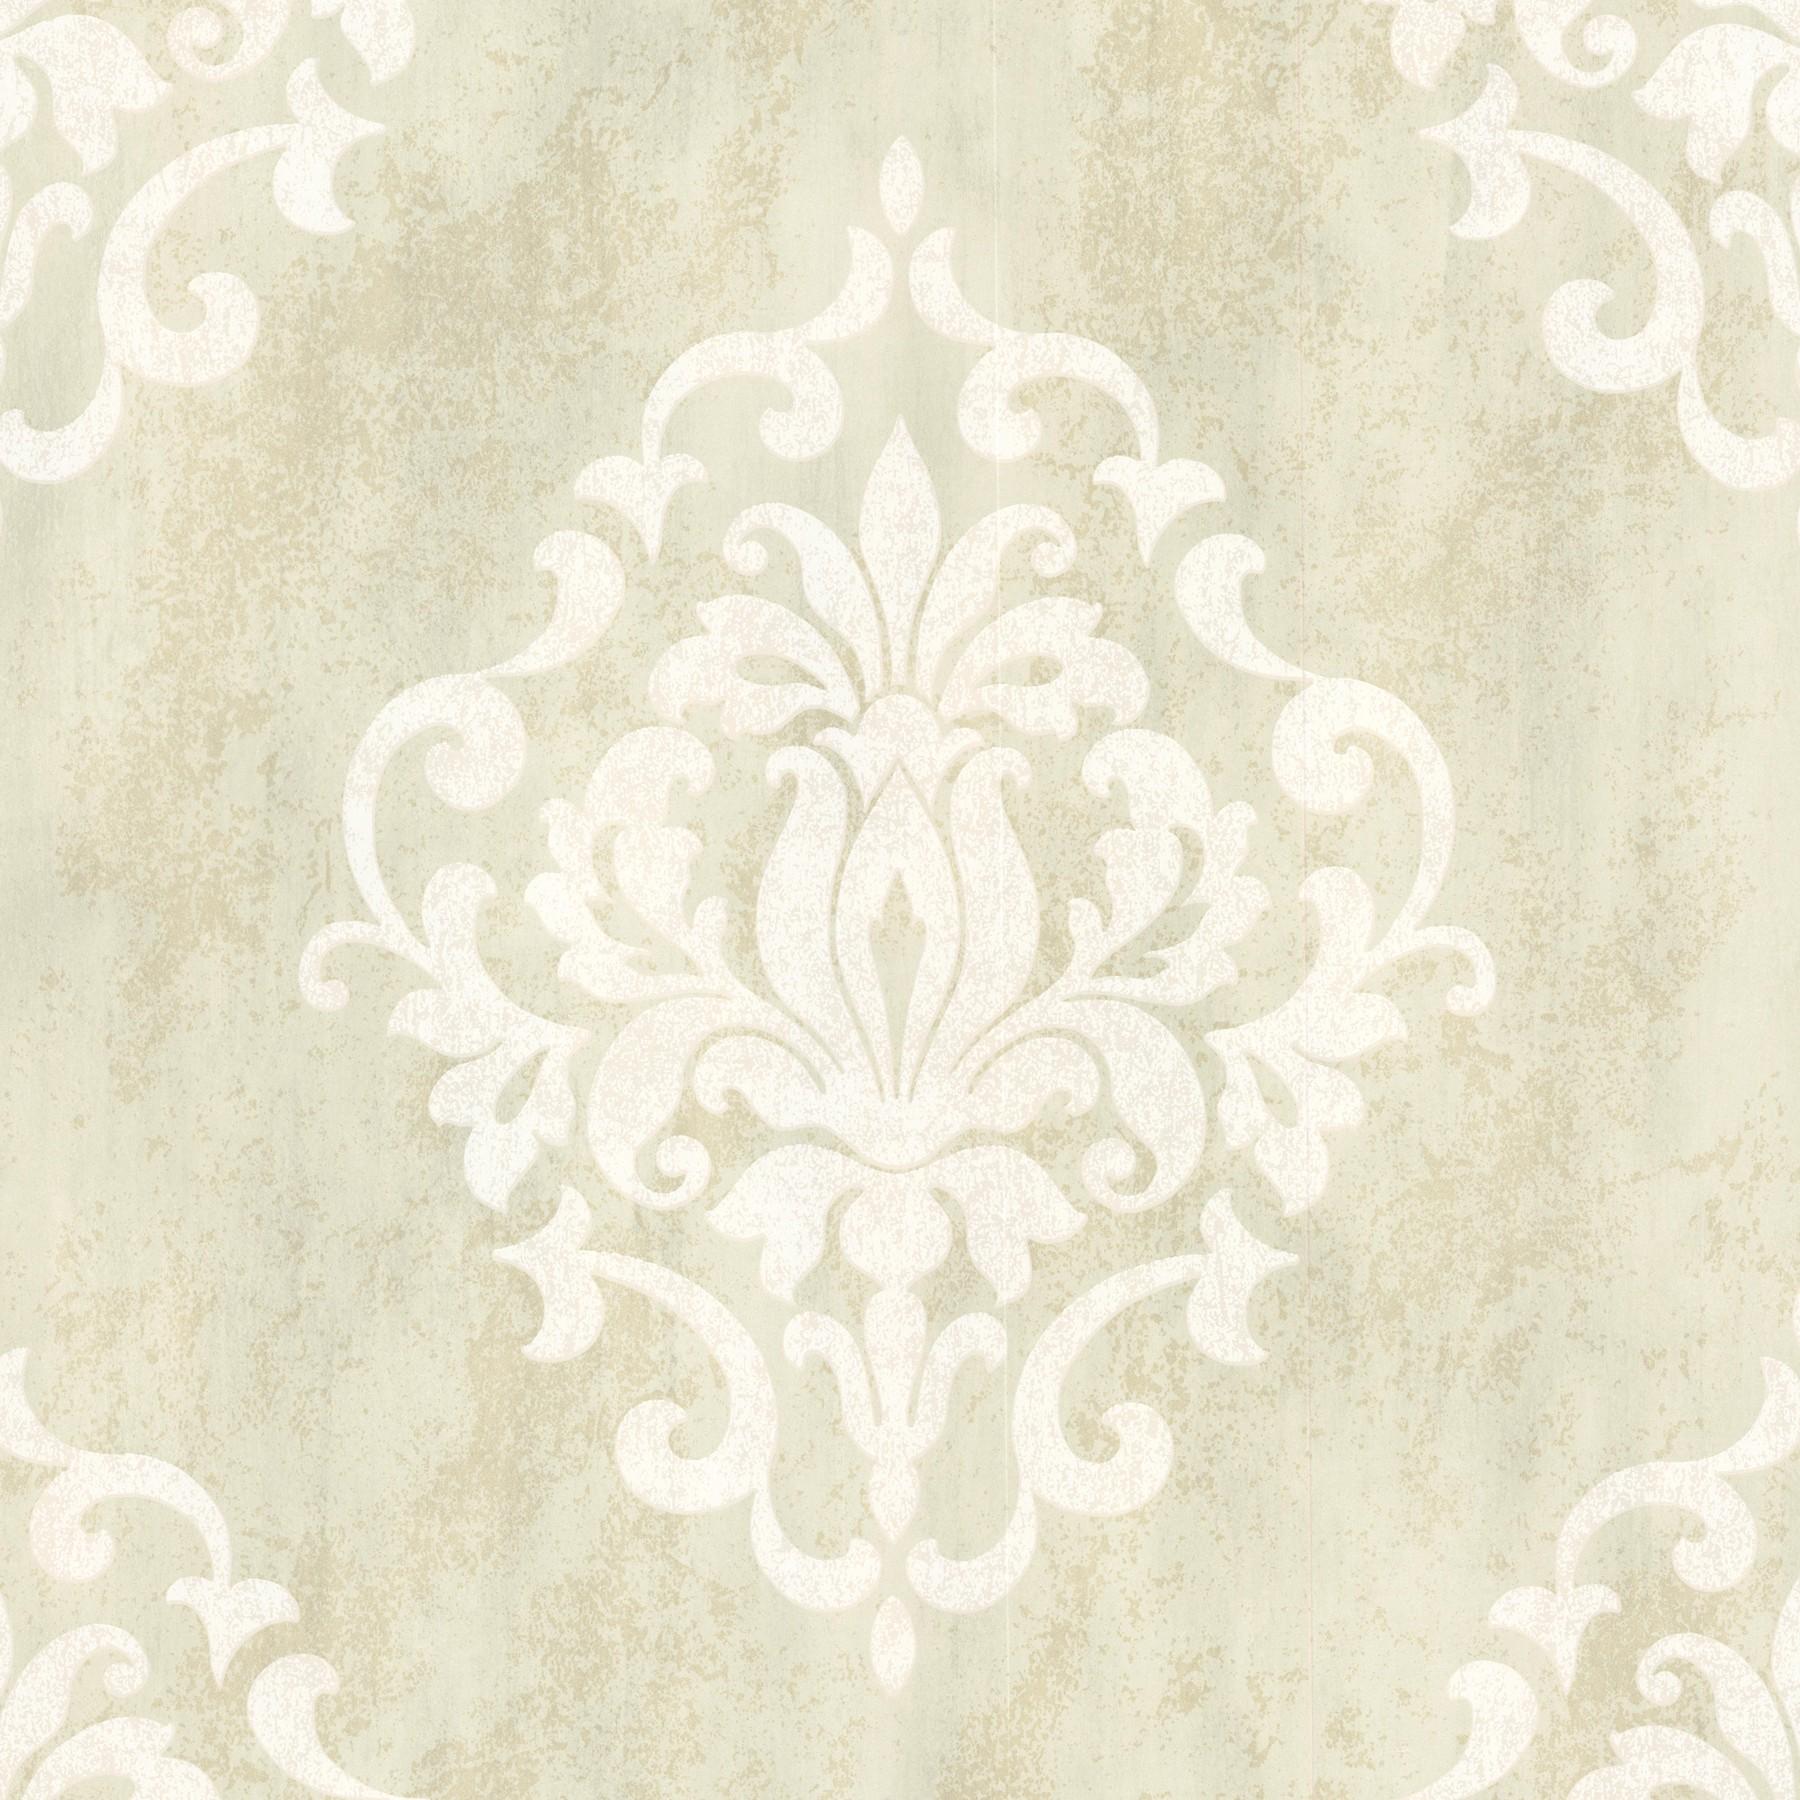 Barock Tapete Auf Leinwand : Tapete Onyx Vliestapete Rasch Textil 020086 Barock beige creme